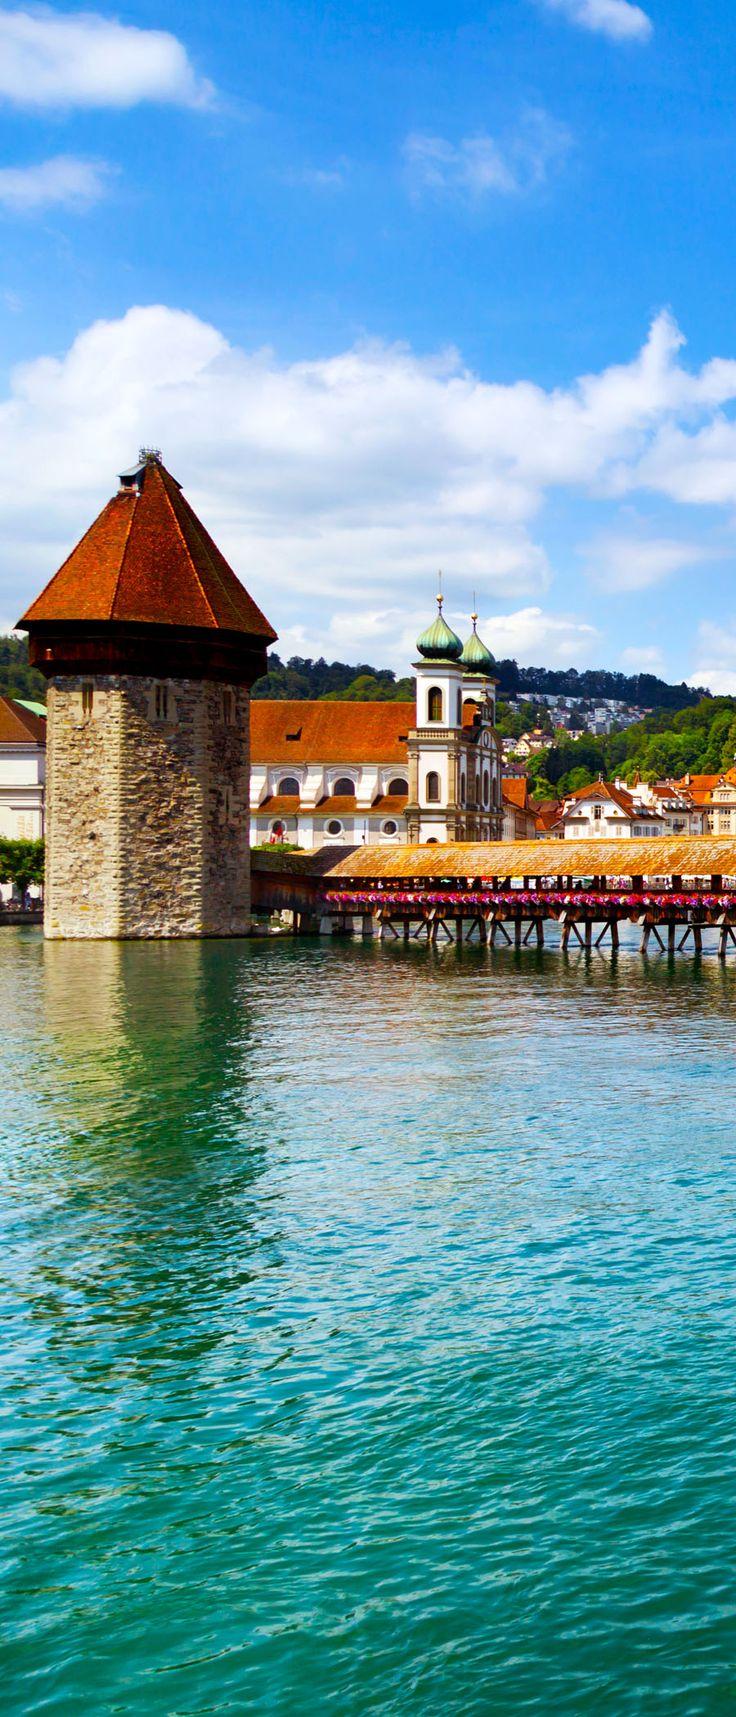 Famous Celebrities Who Born in Bern, Switzerland